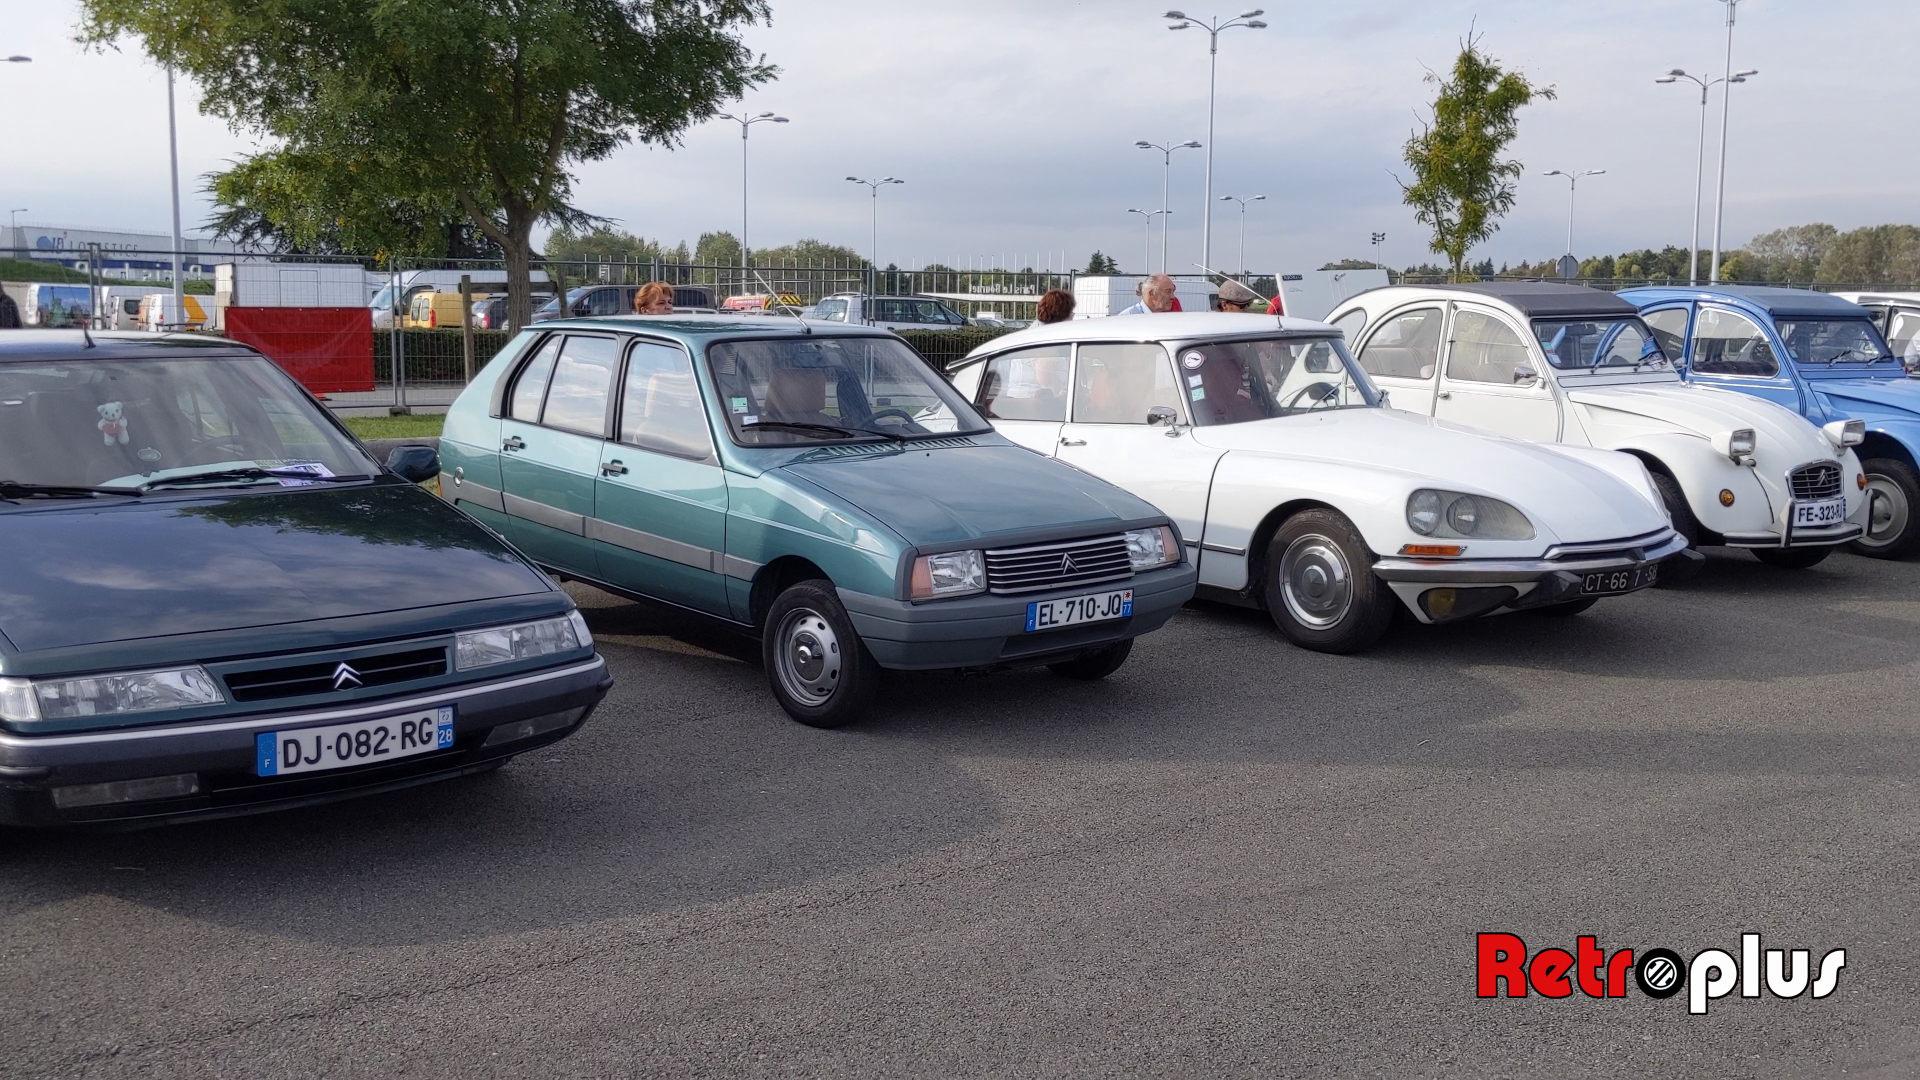 Automedon2019-parkingCitroen5